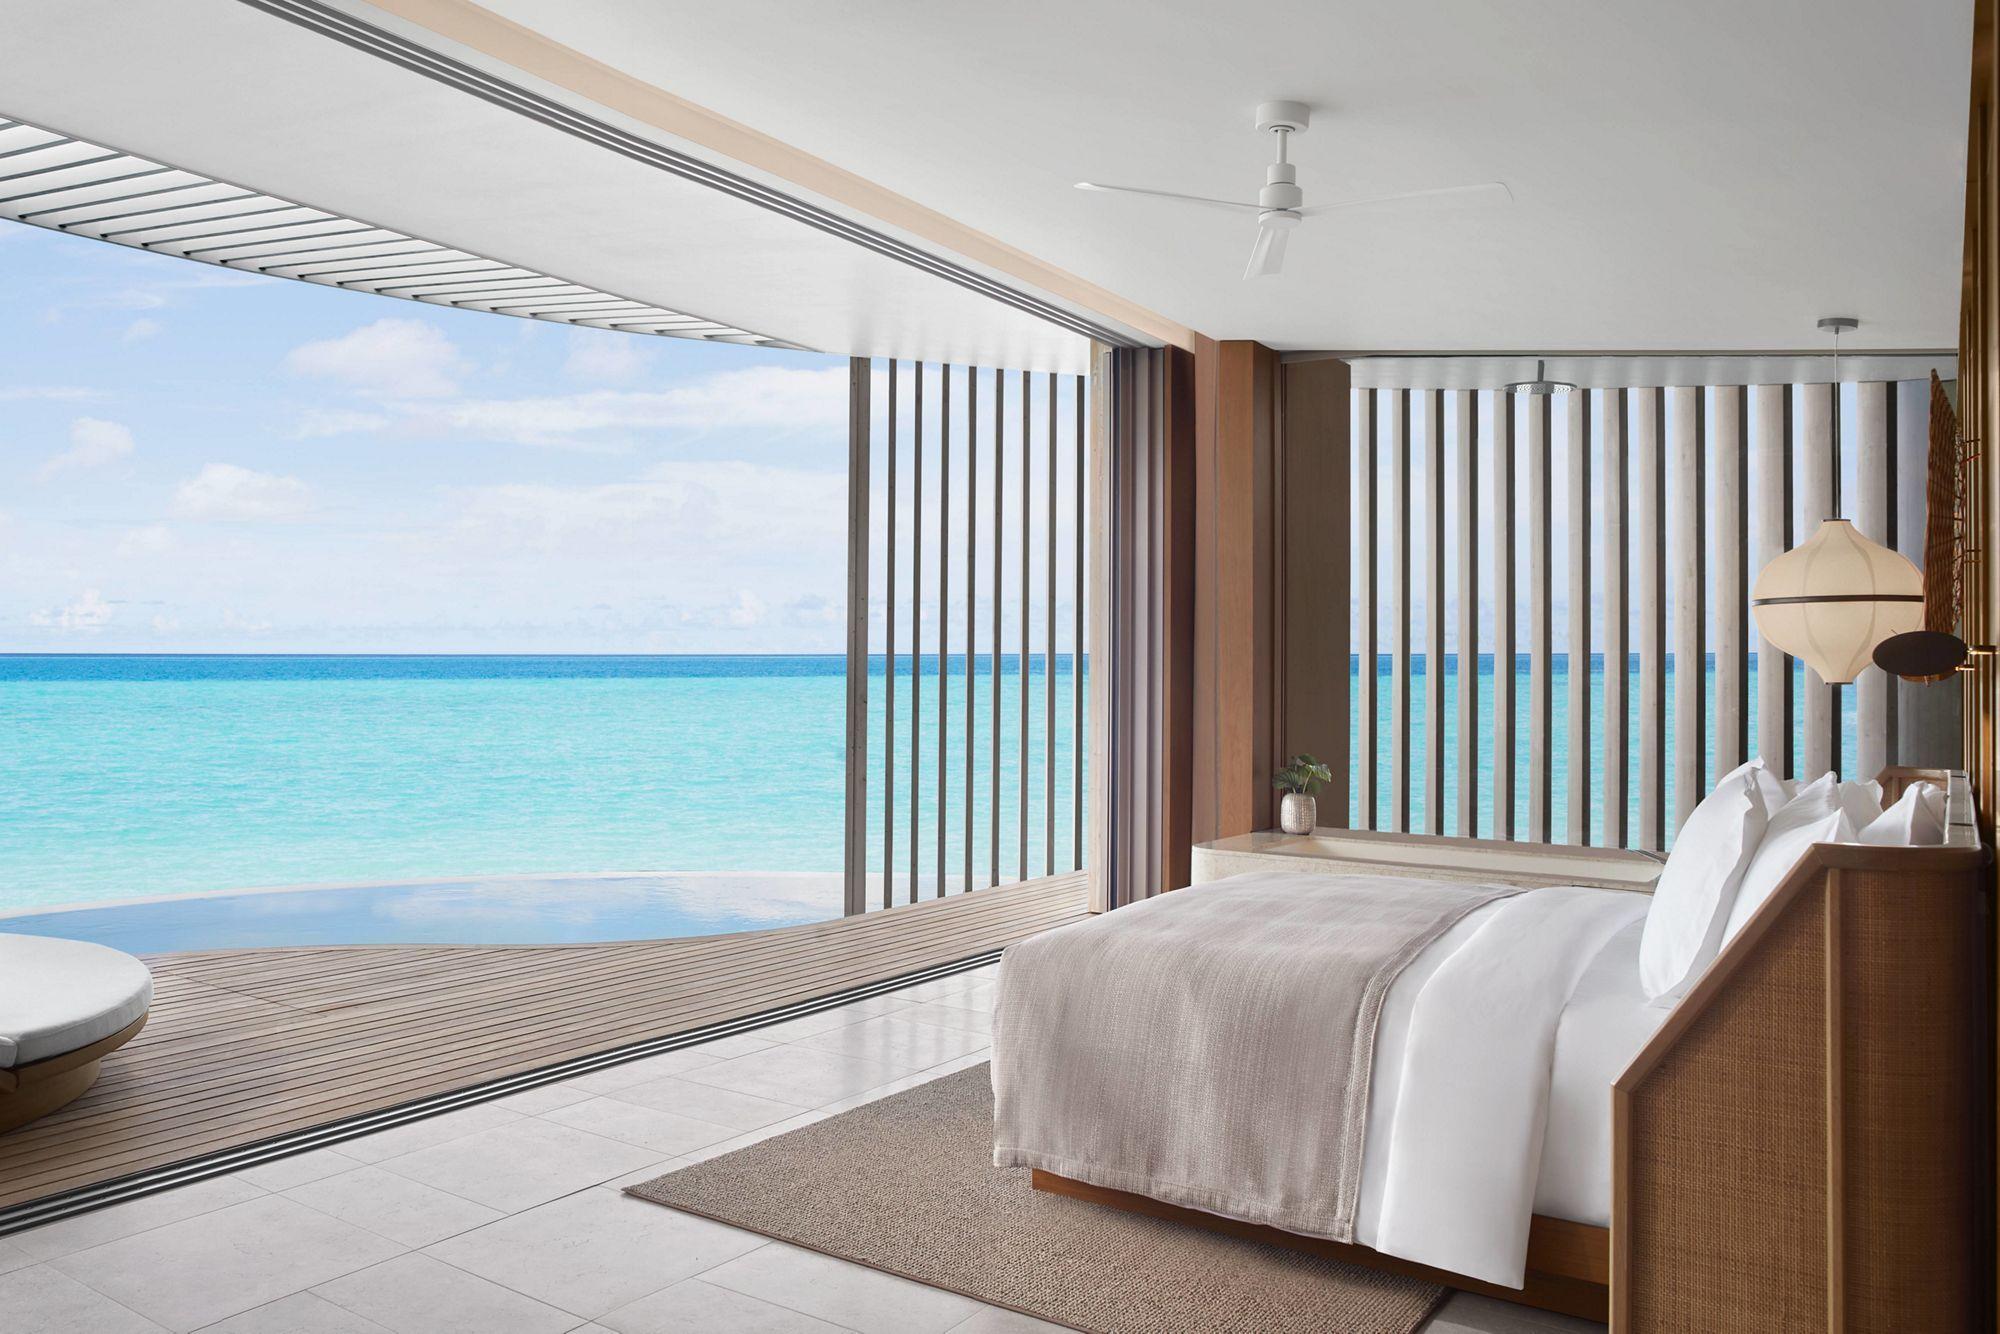 Ritz-Carlton 馬爾地夫的設計風格極簡自然。